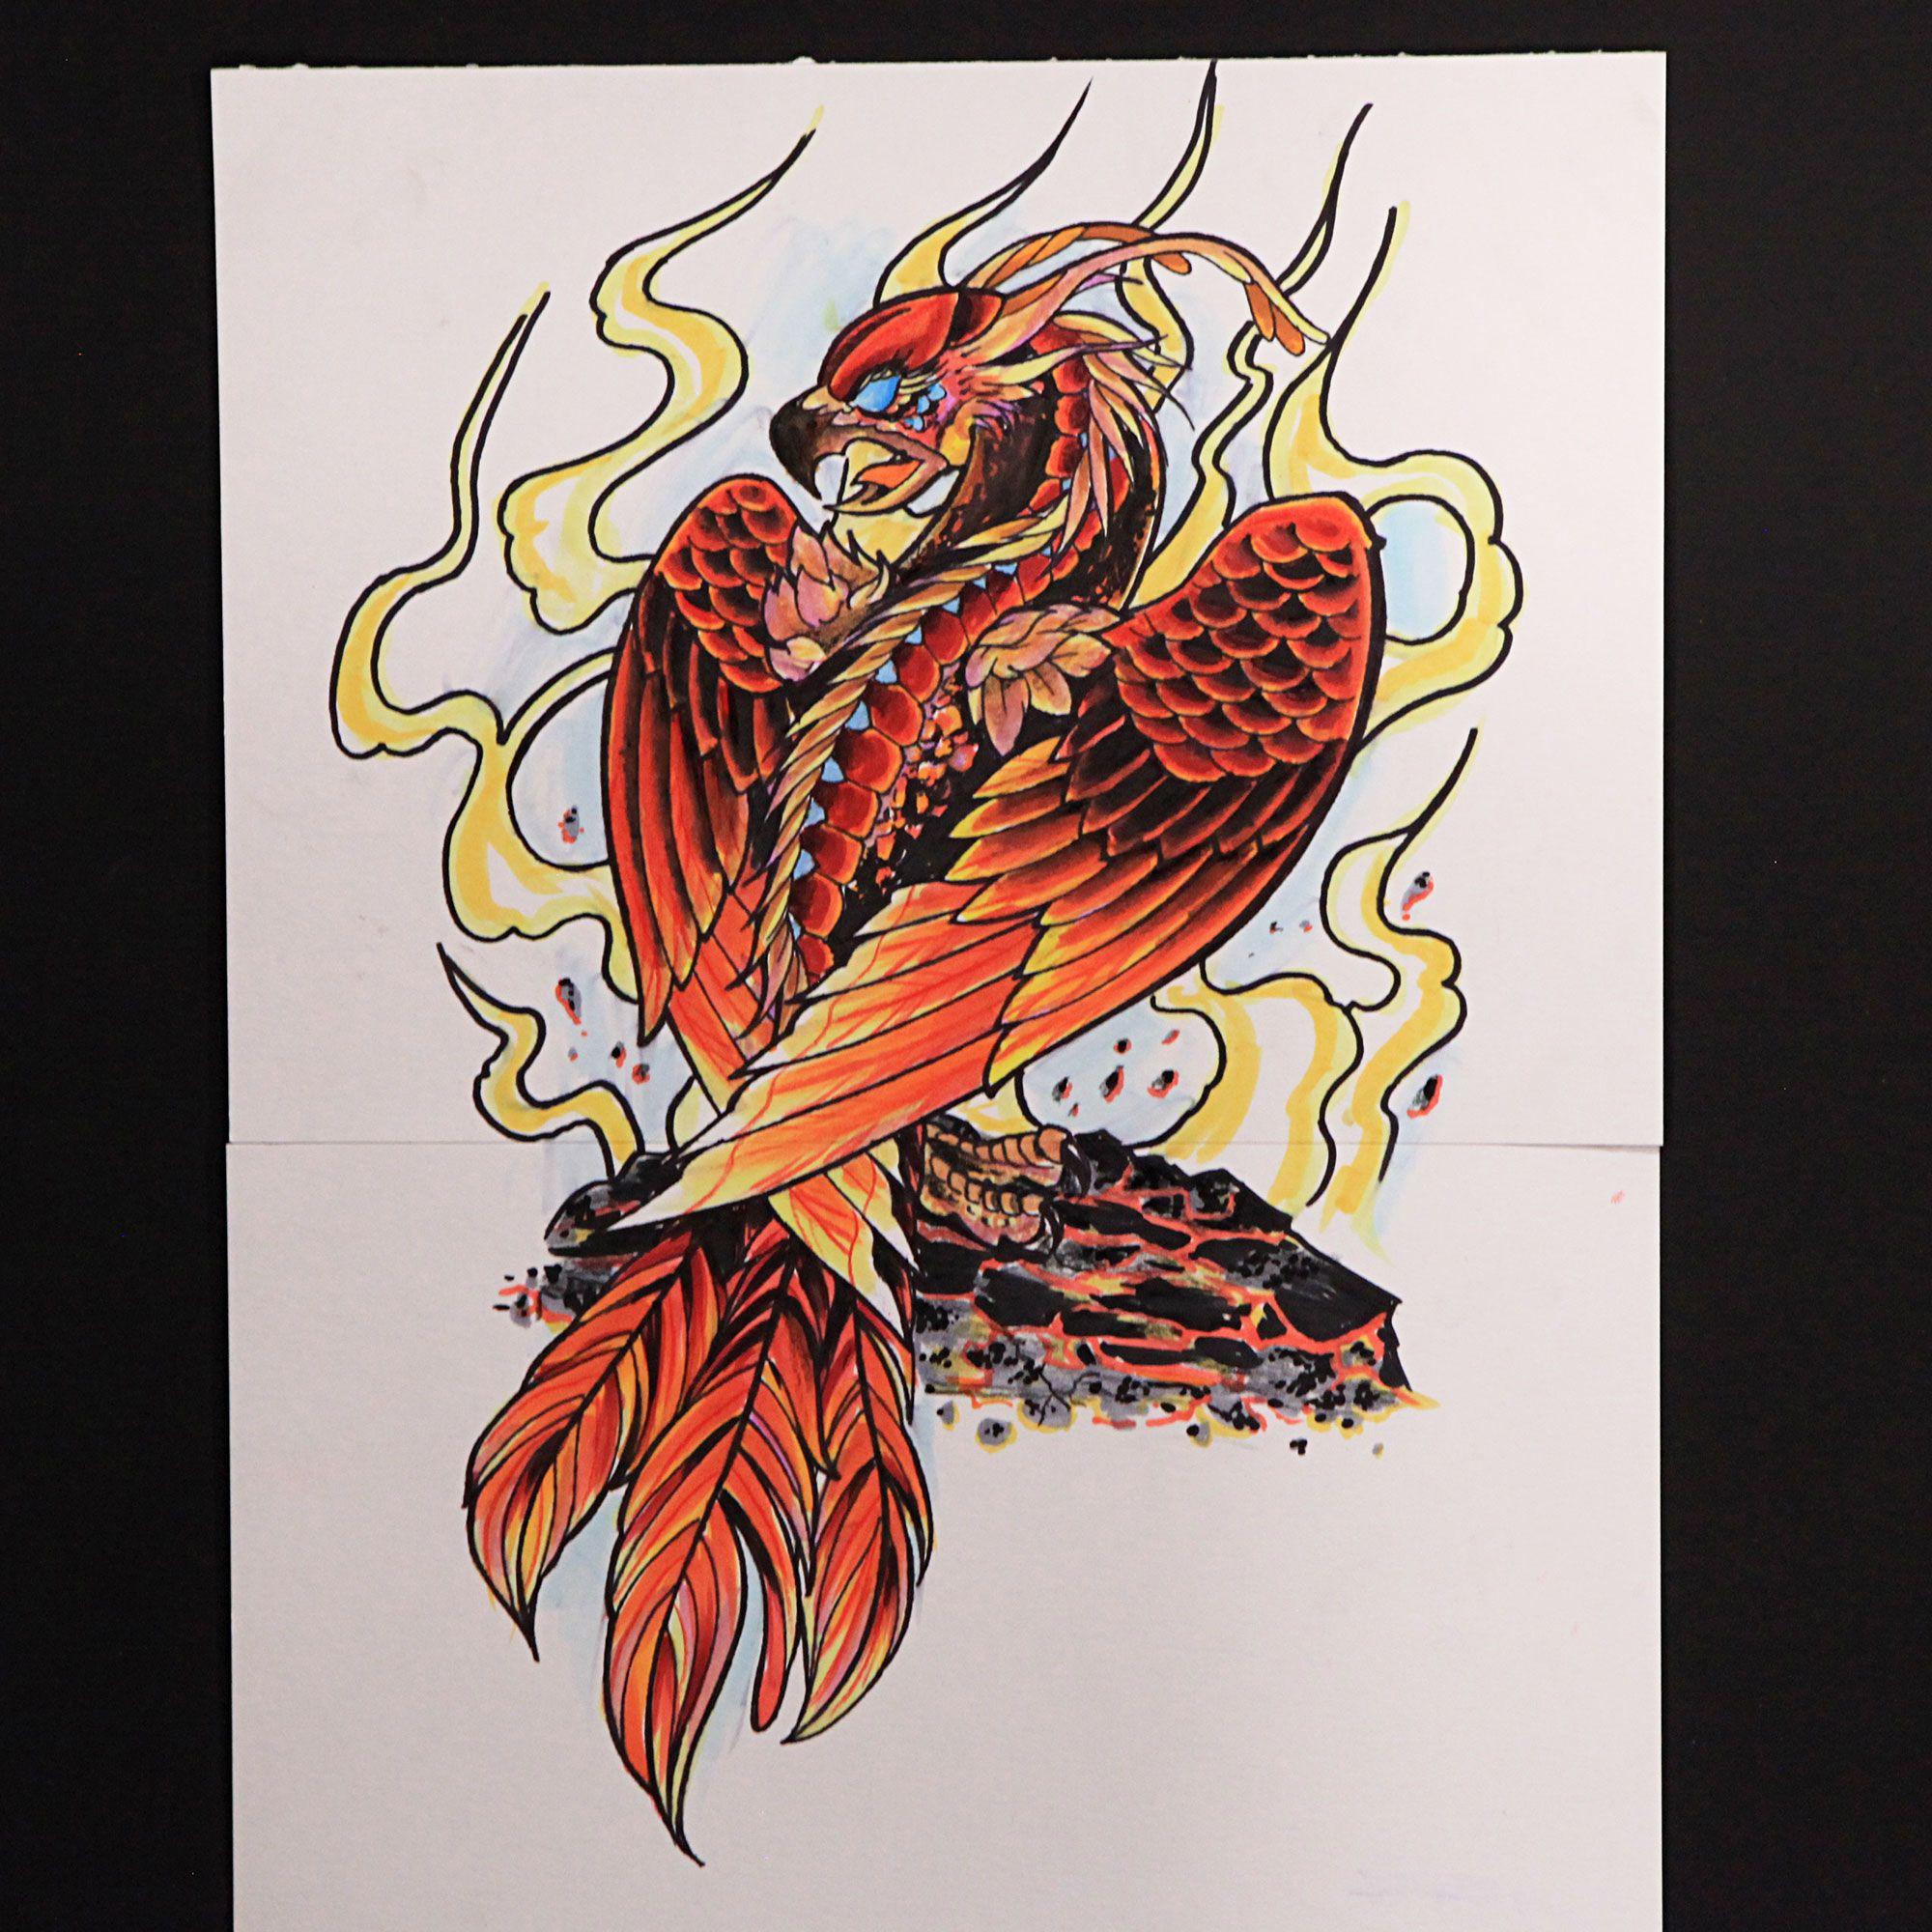 Ink Master Ink master, Ink, Tattoos